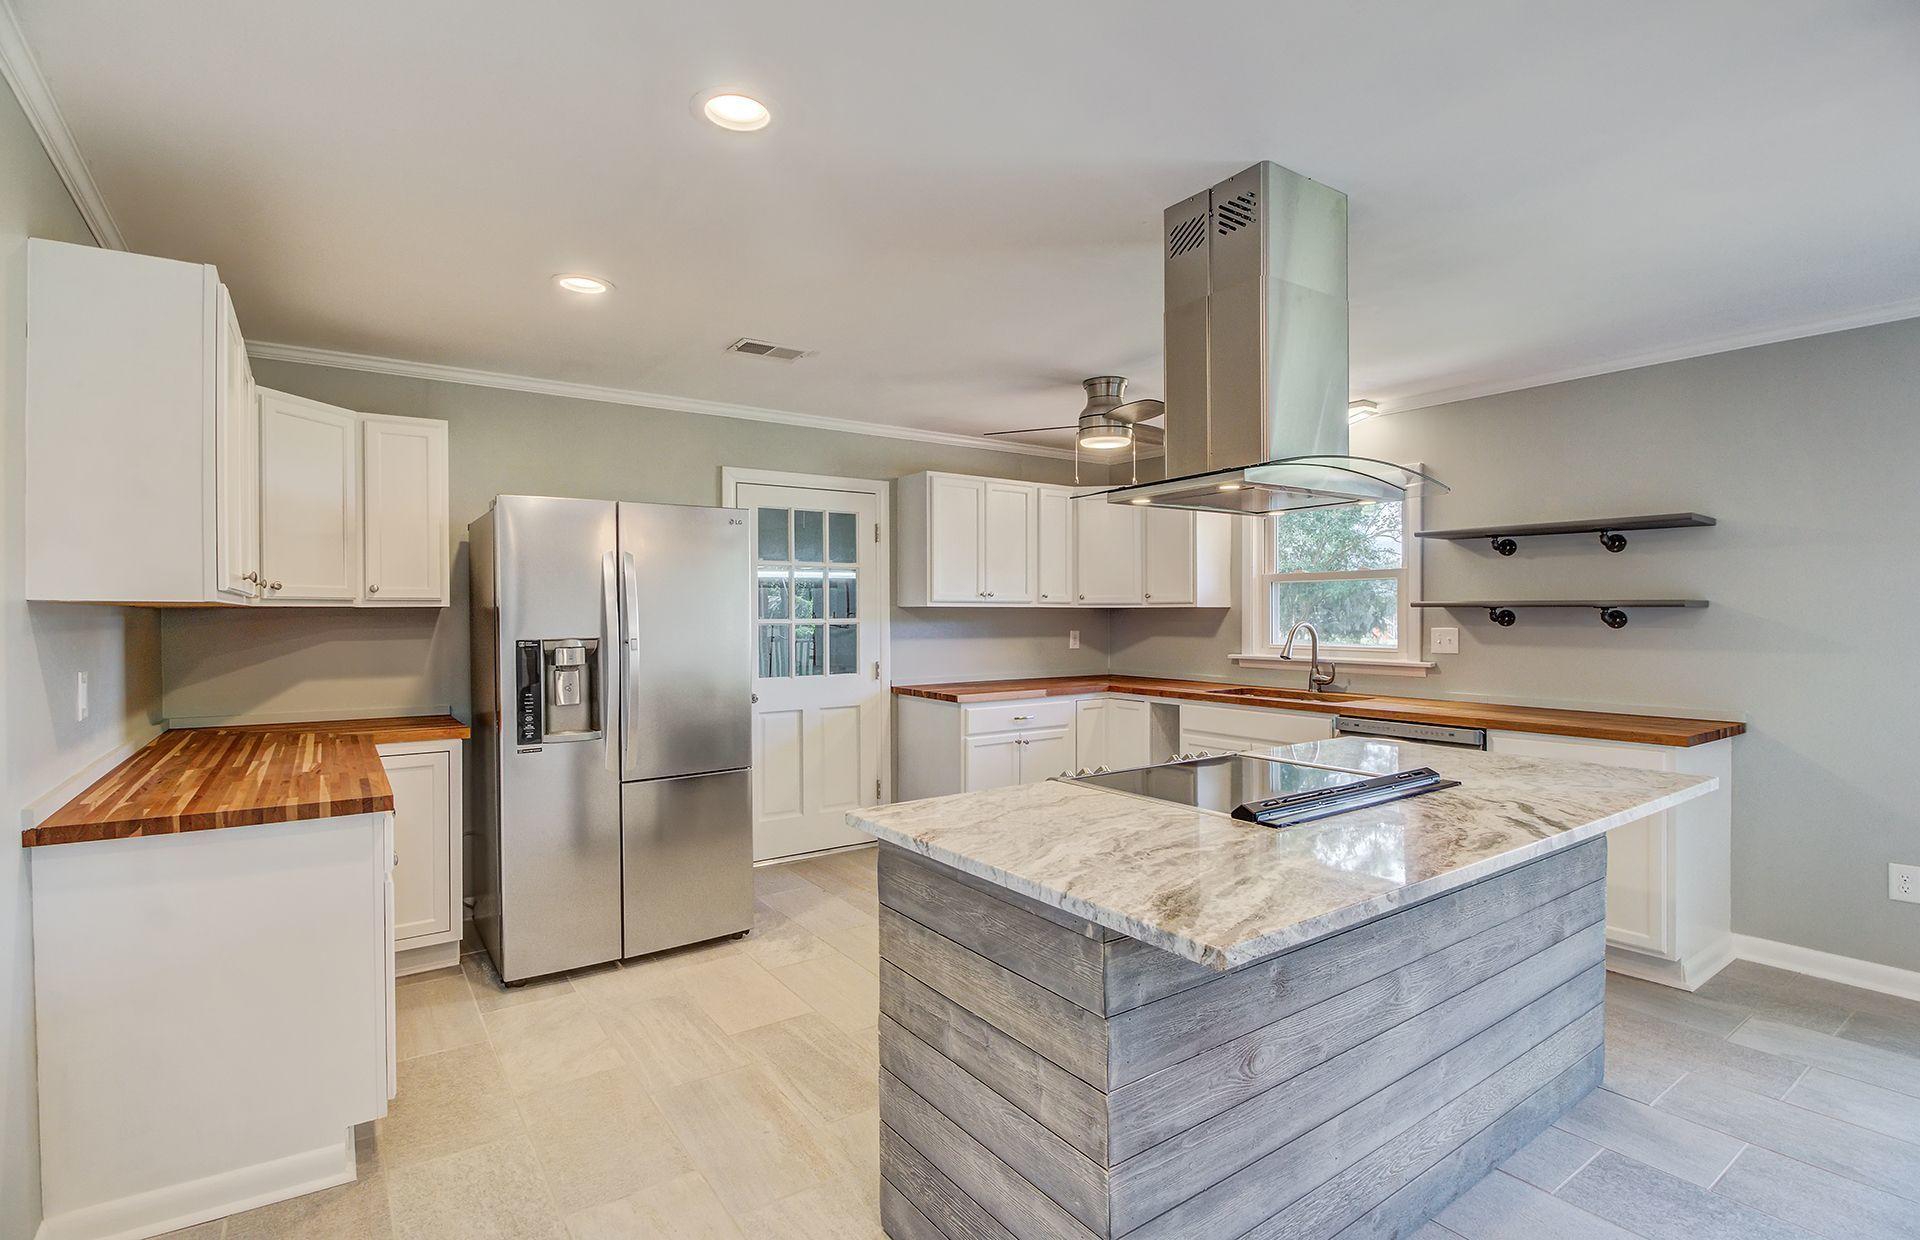 Belvedere Estates Homes For Sale - 6010 Ridgecrest, Hanahan, SC - 6